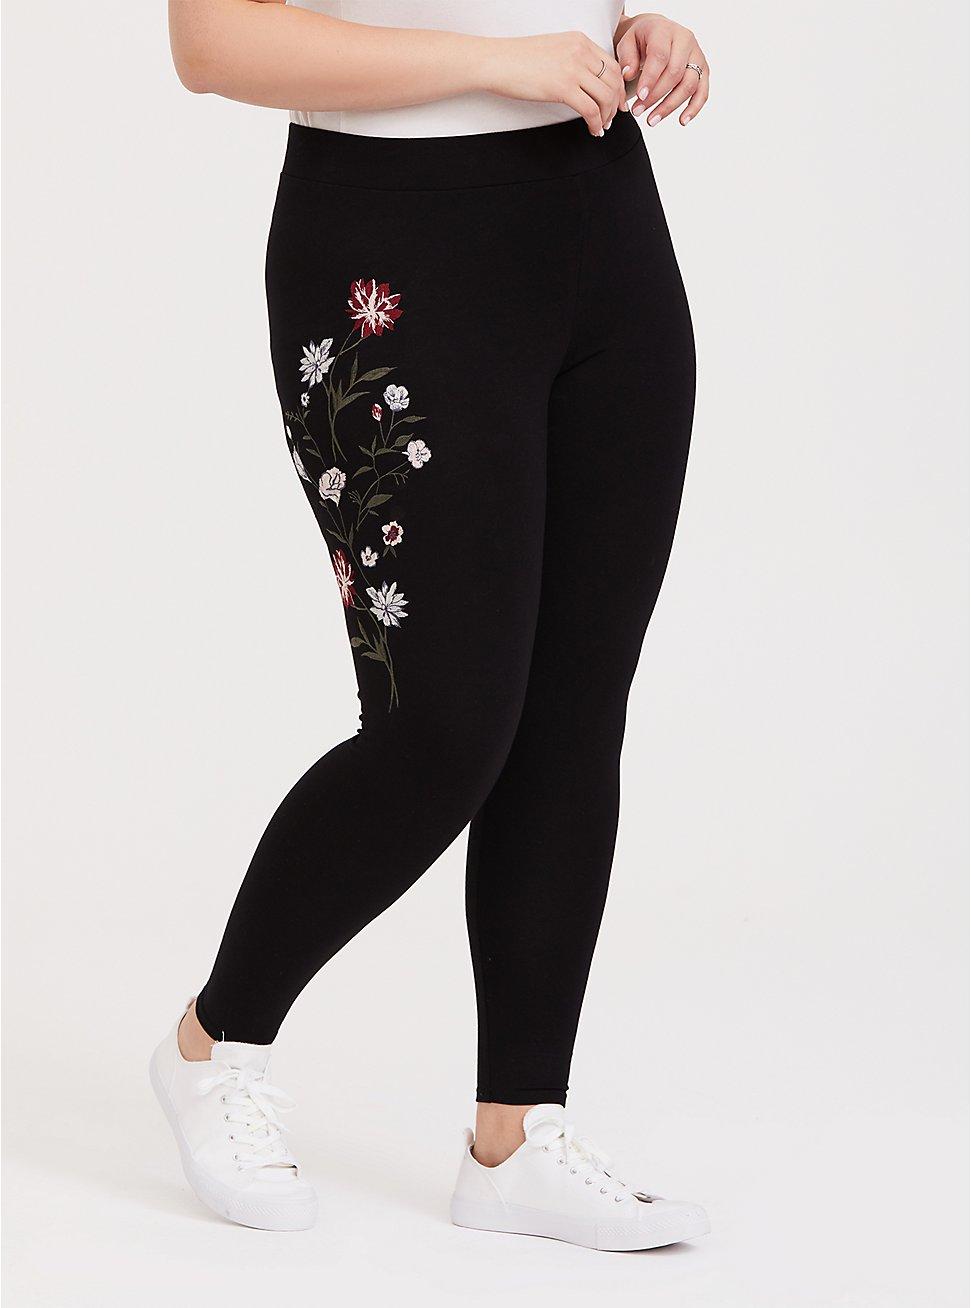 Premium Legging - Floral Embroidered Black, BLACK, hi-res